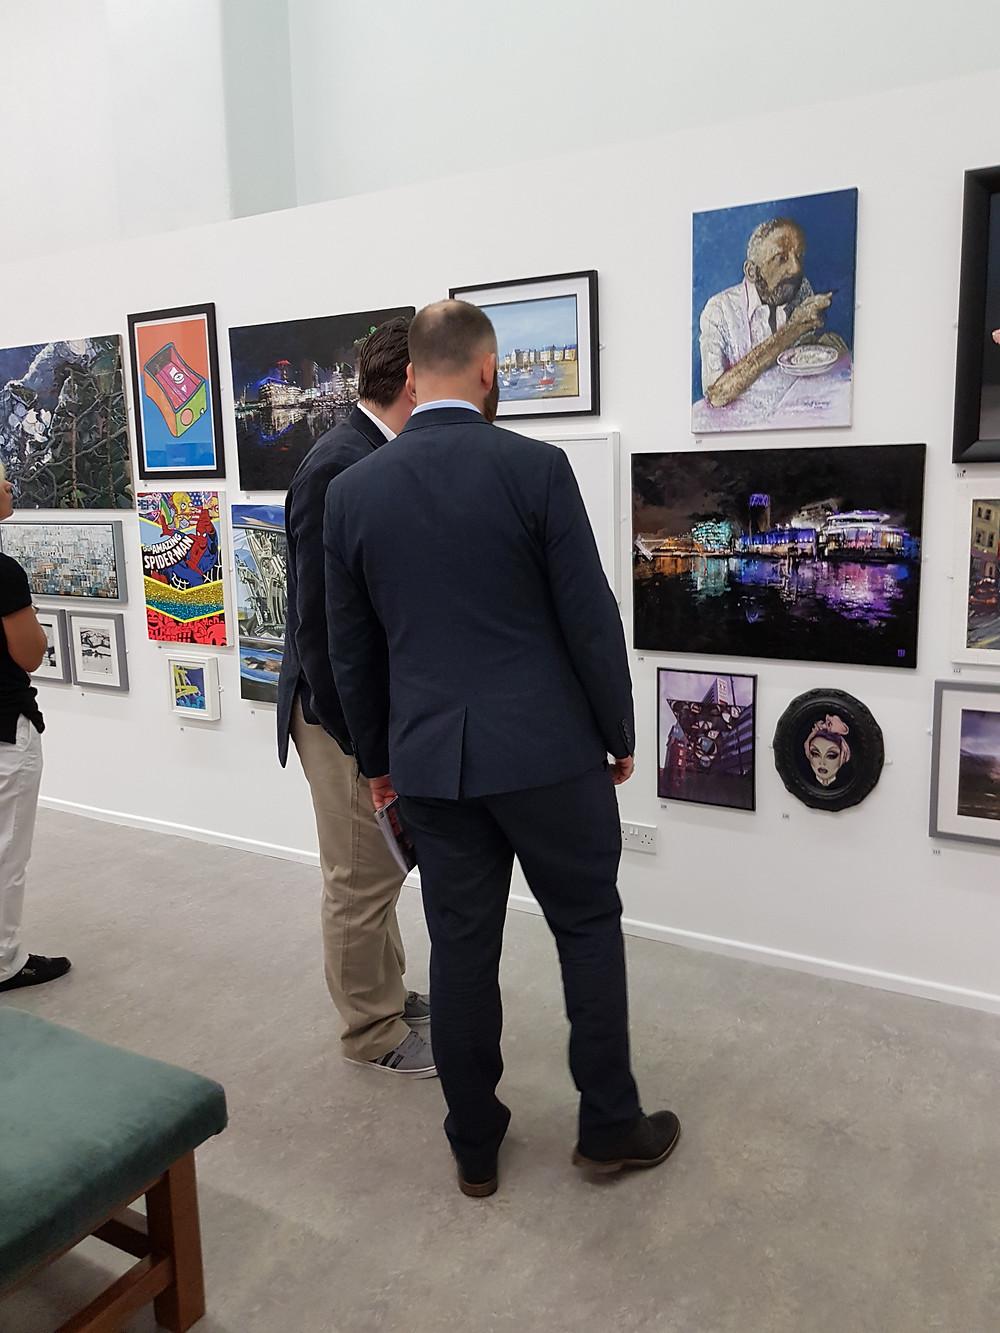 Two people viewing Ben Ark Artwork